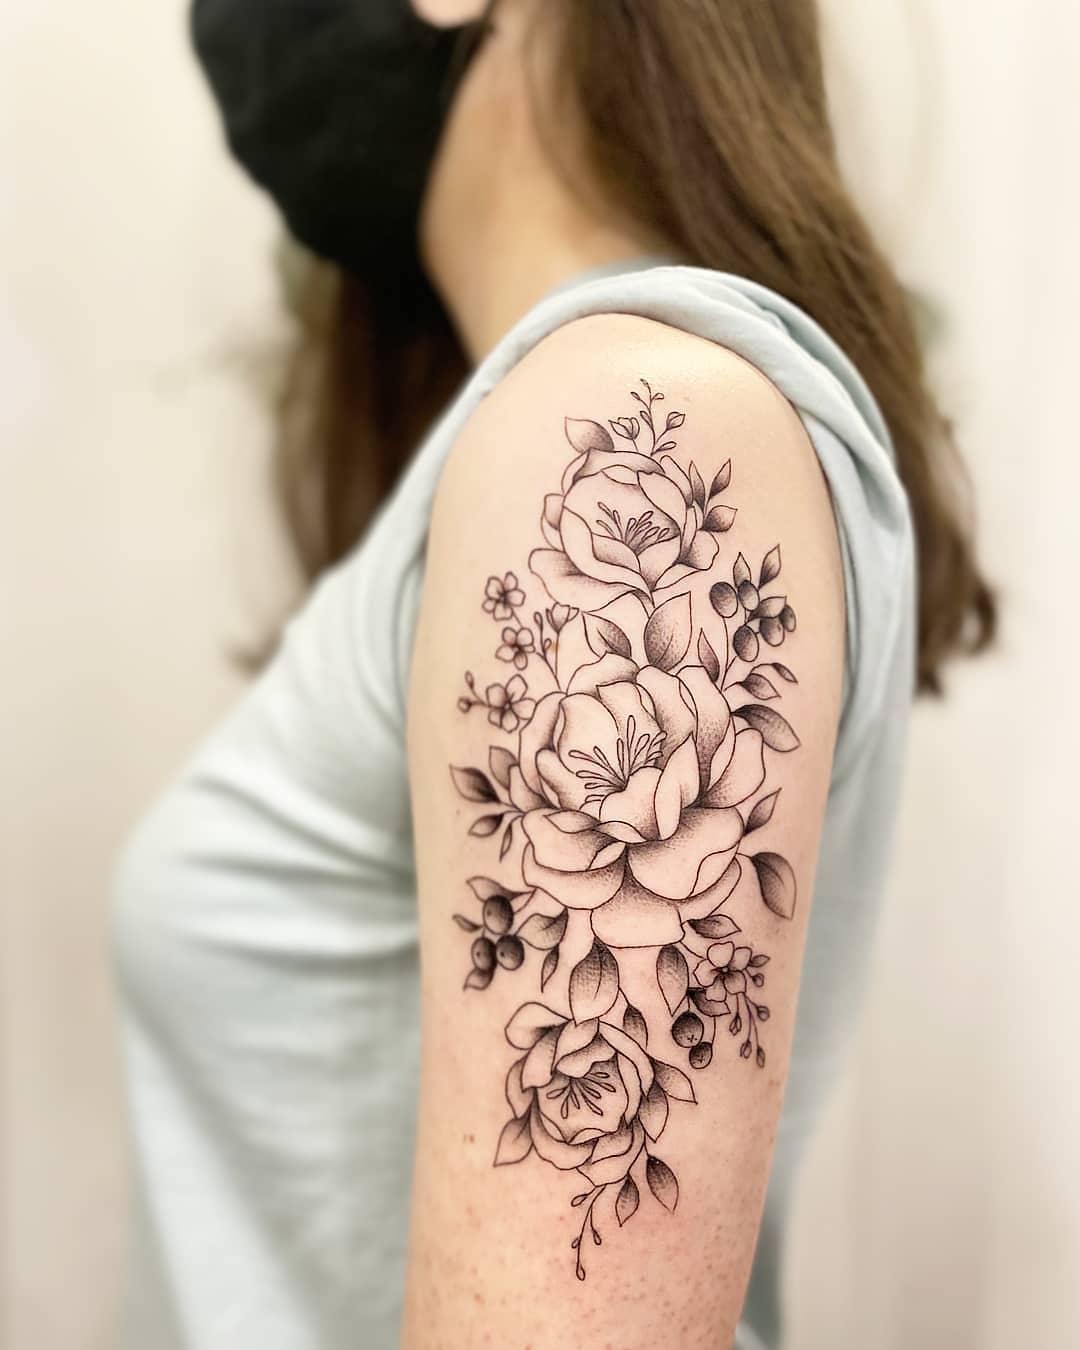 tattoo-ideas-for-women-peonies